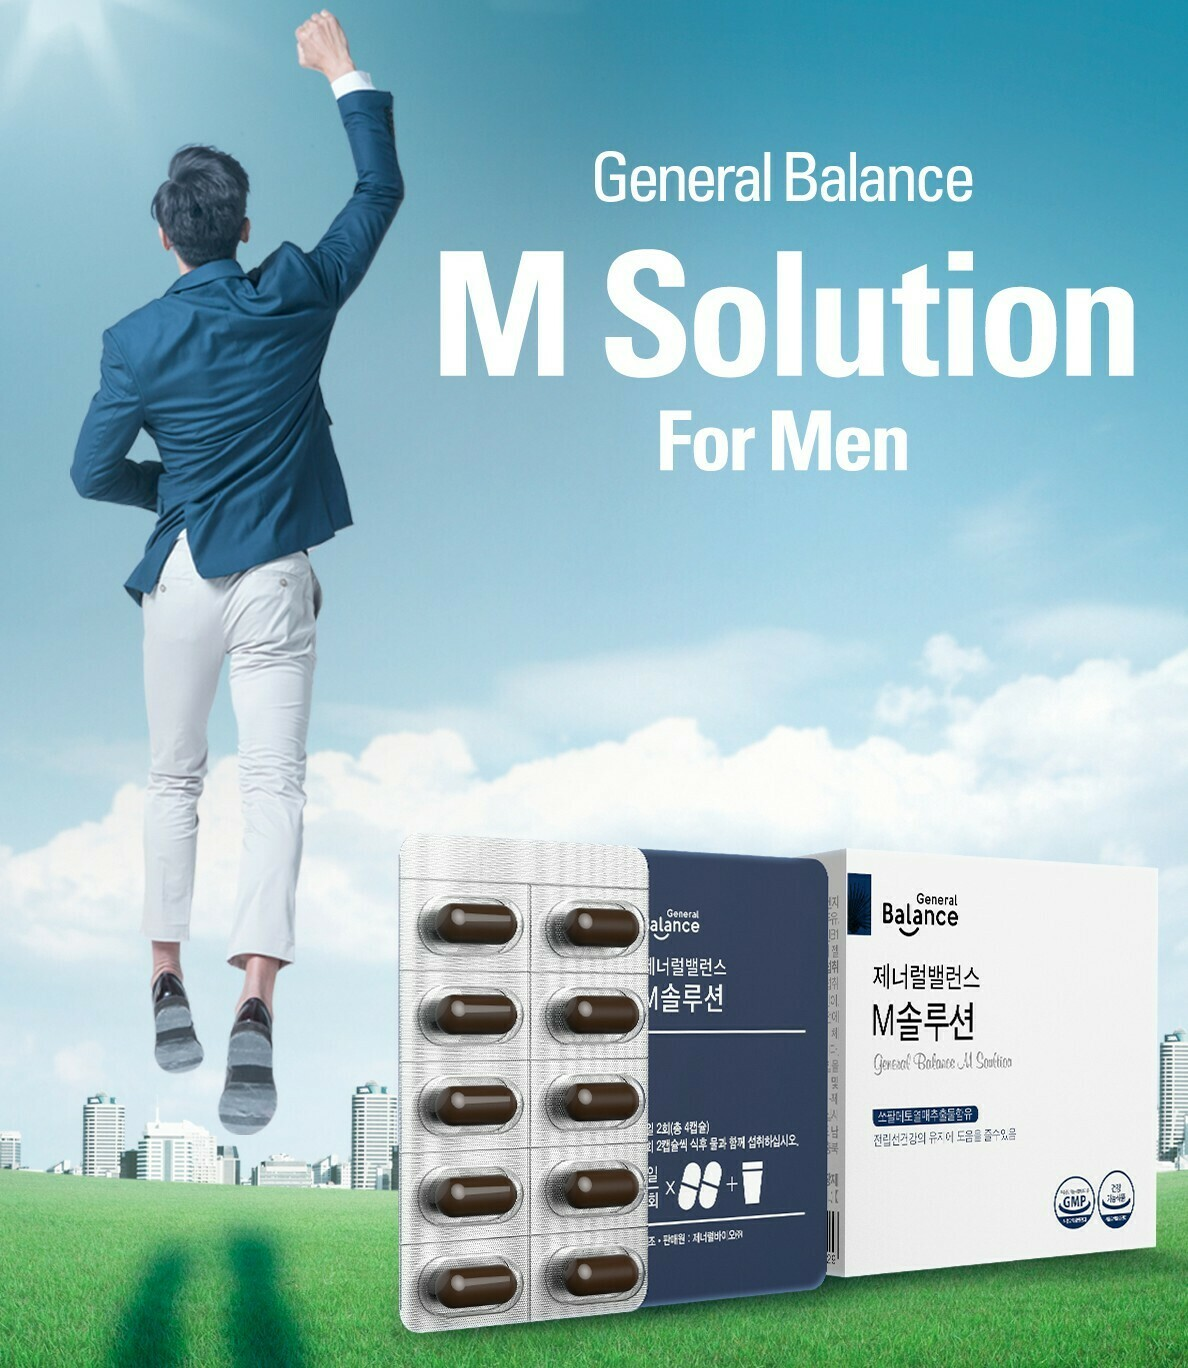 General Balance M Solution